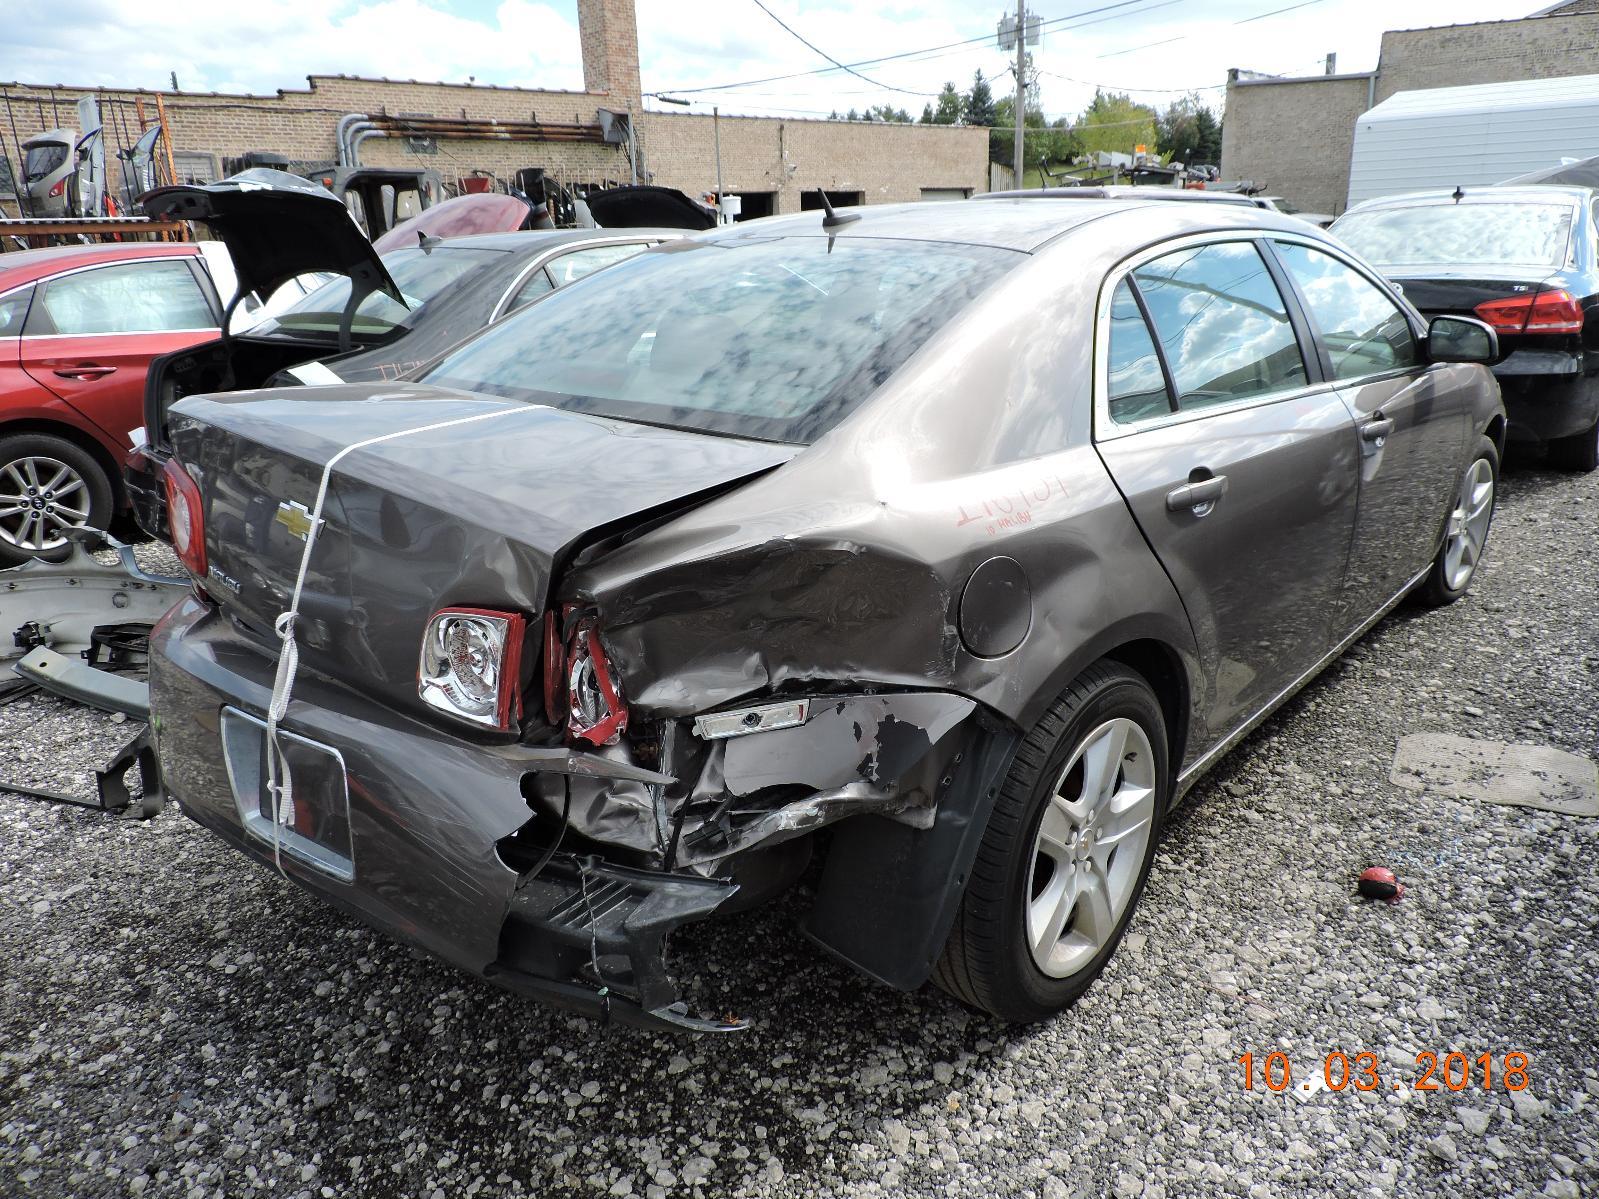 Chevrolet Malibu Hood Used Auto Parts 2000 Chevy Fuse Box Fan 75118ede 7eea 4a26 Af15 220c56458134